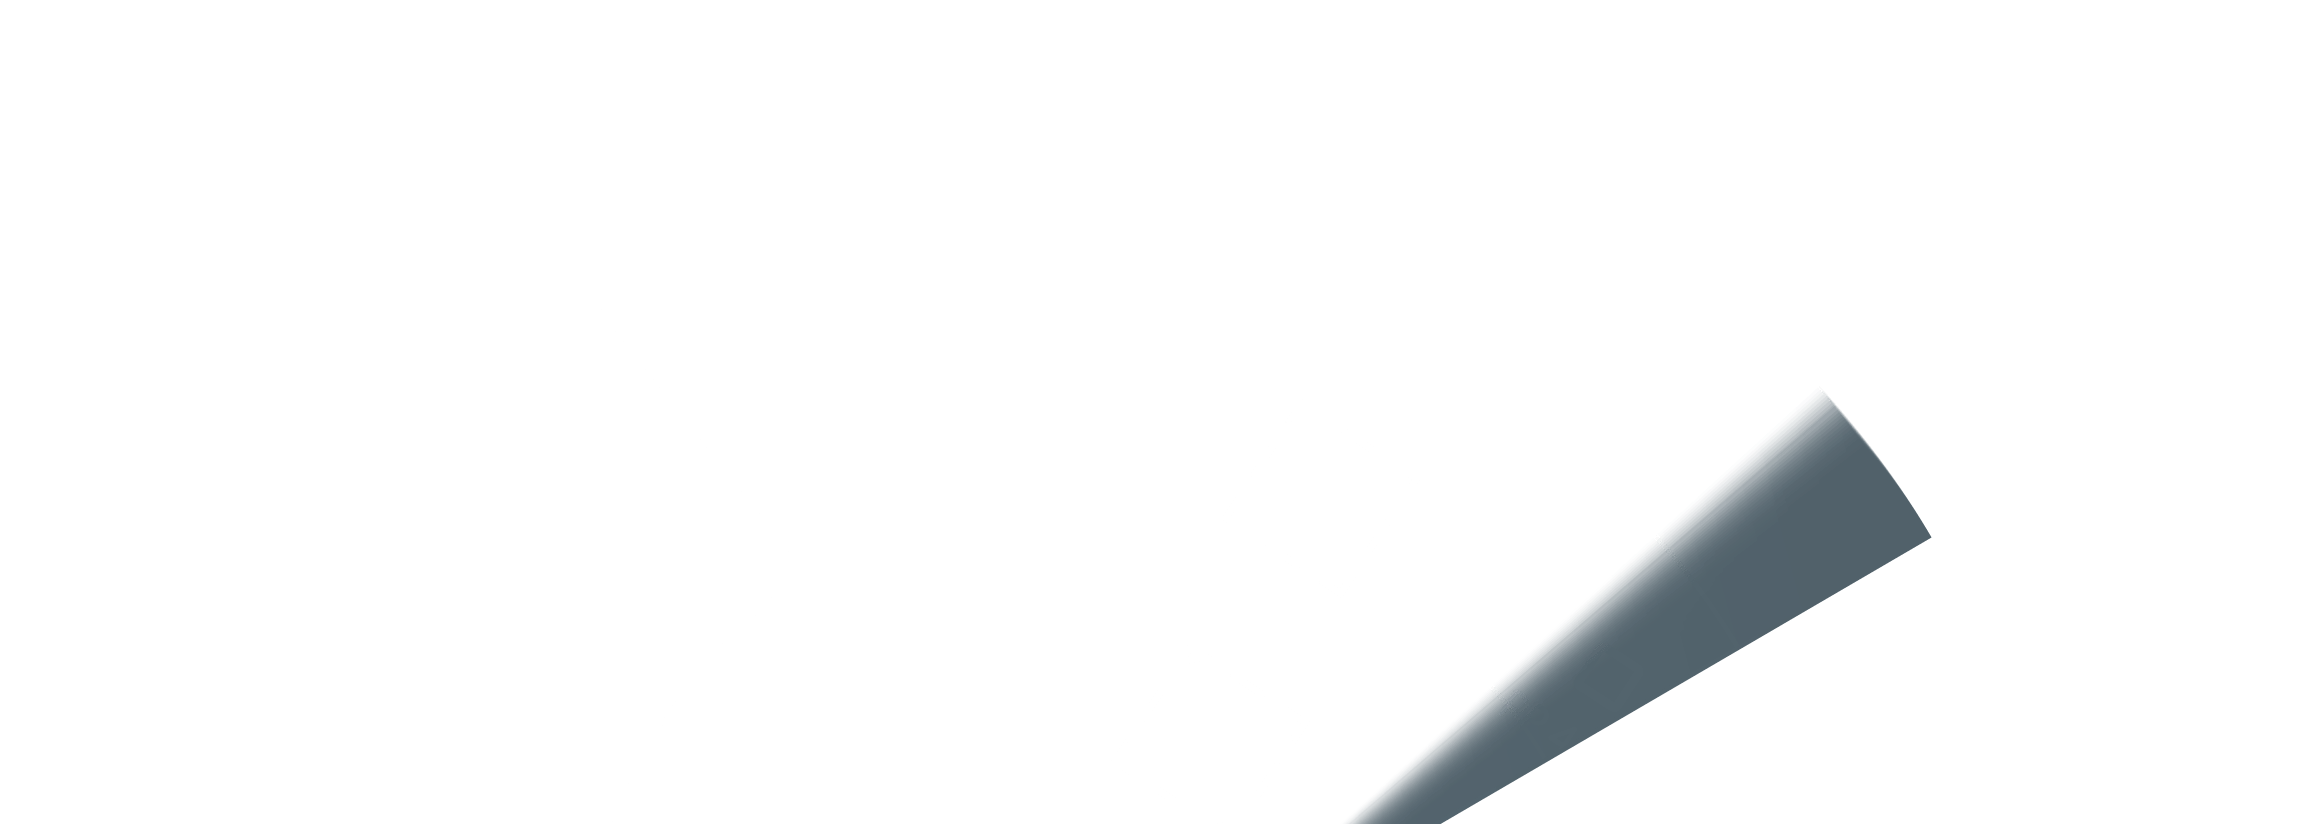 Line drawing of a radar